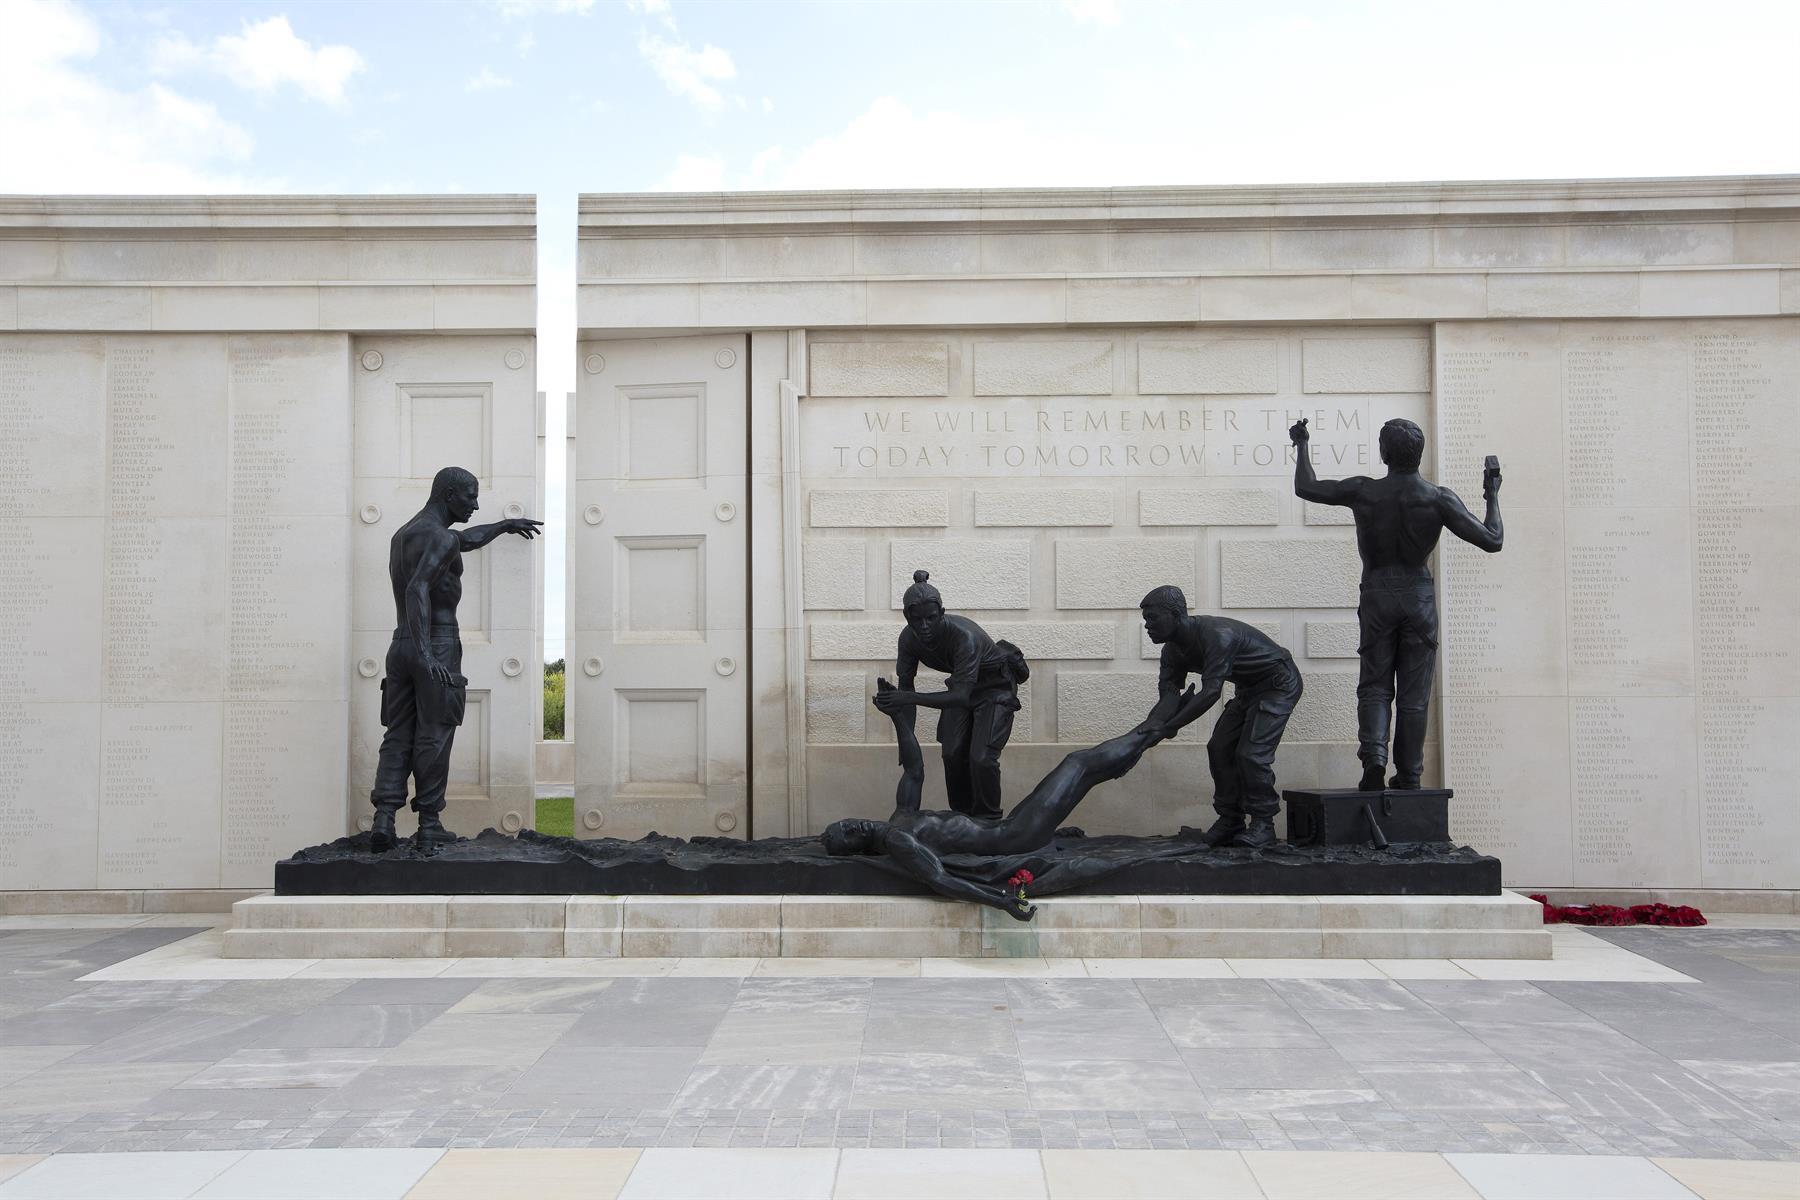 Armed Forces Memorial Enjoy Staffordhshire (1)